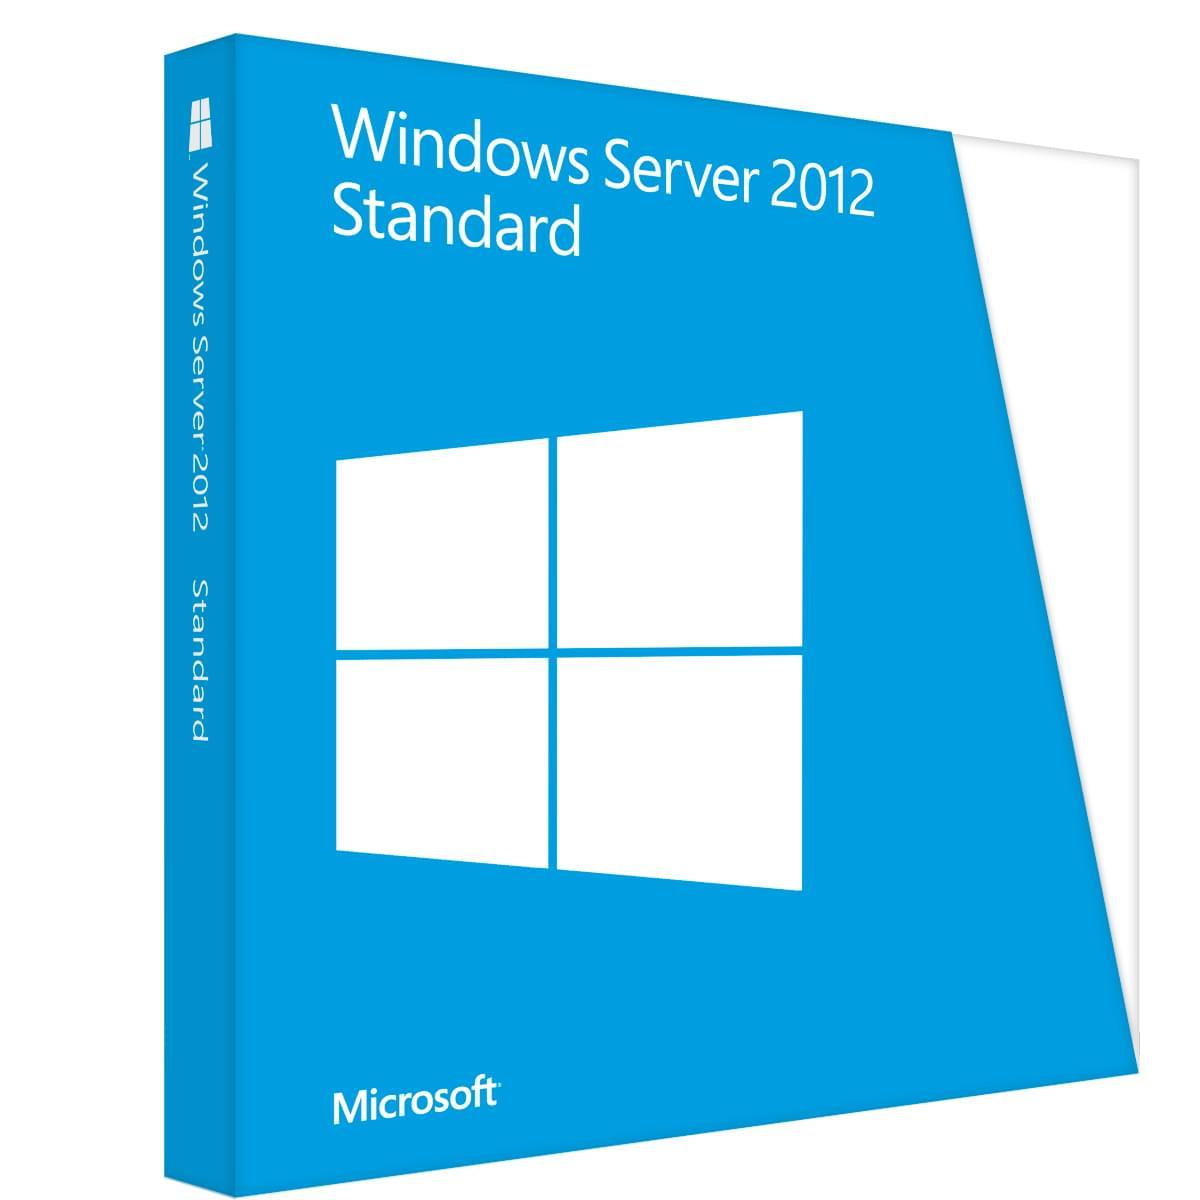 Microsoft CAL User Windows Server 2012 Standard DUST (25076) - Achat / Vente Logiciel système exploitation sur Cybertek.fr - 0